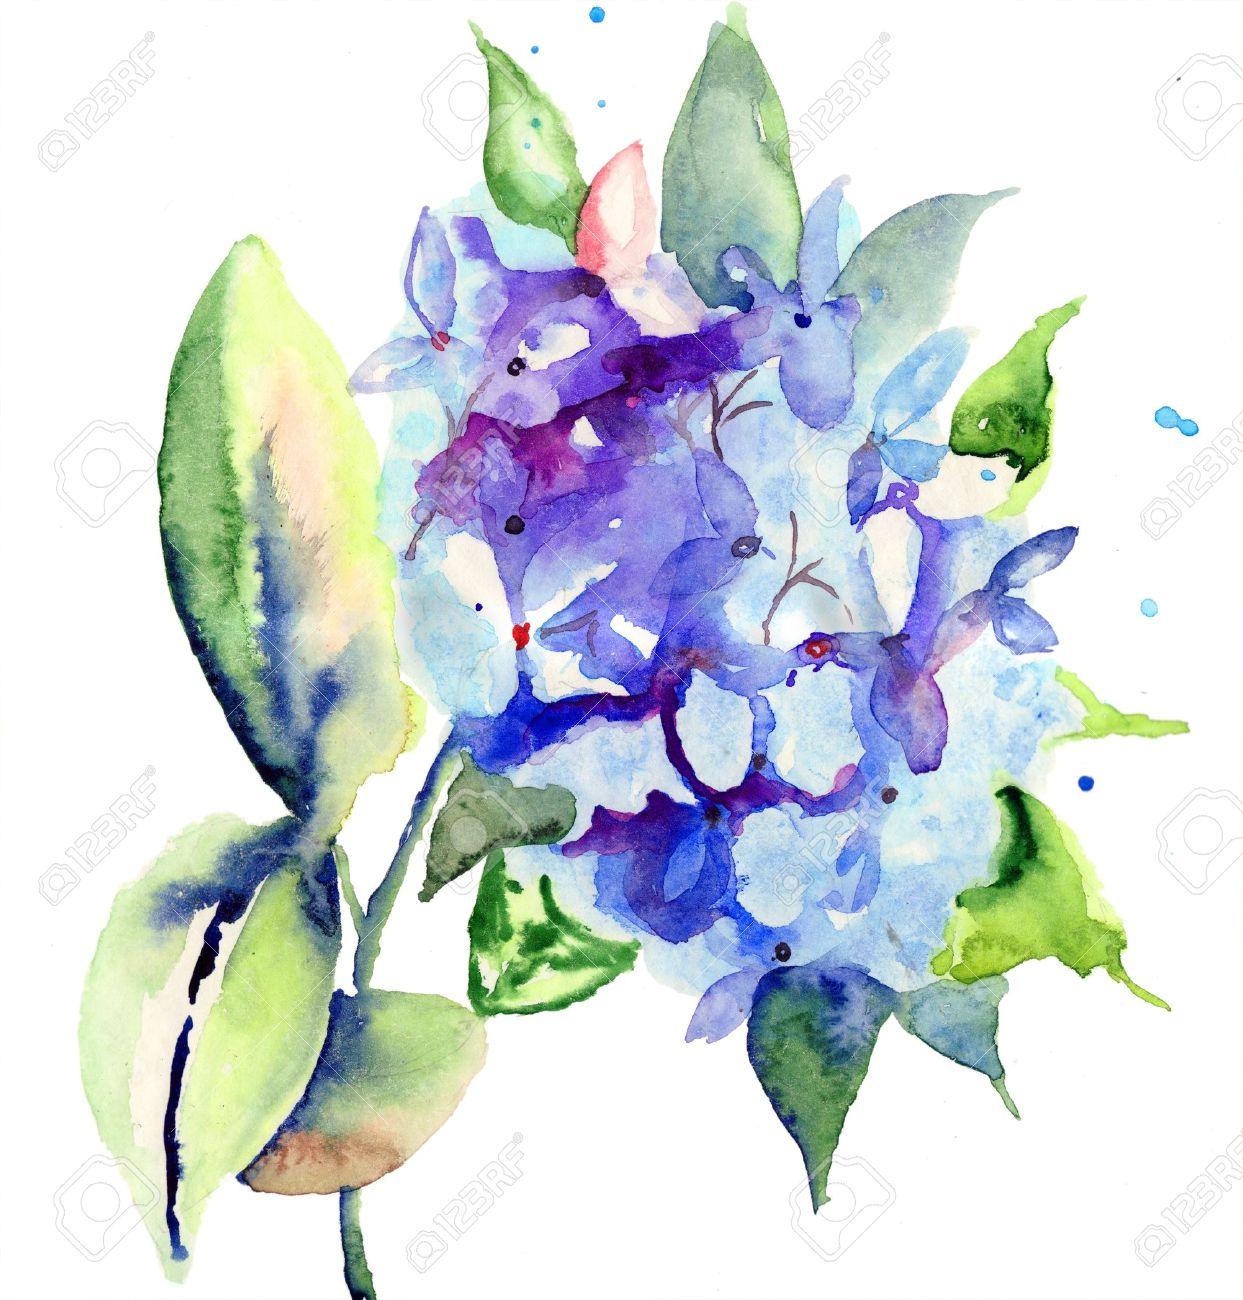 Beautiful blue flowers watercolor illustration stock photo picture beautiful blue flowers watercolor illustration stock illustration 17008952 izmirmasajfo